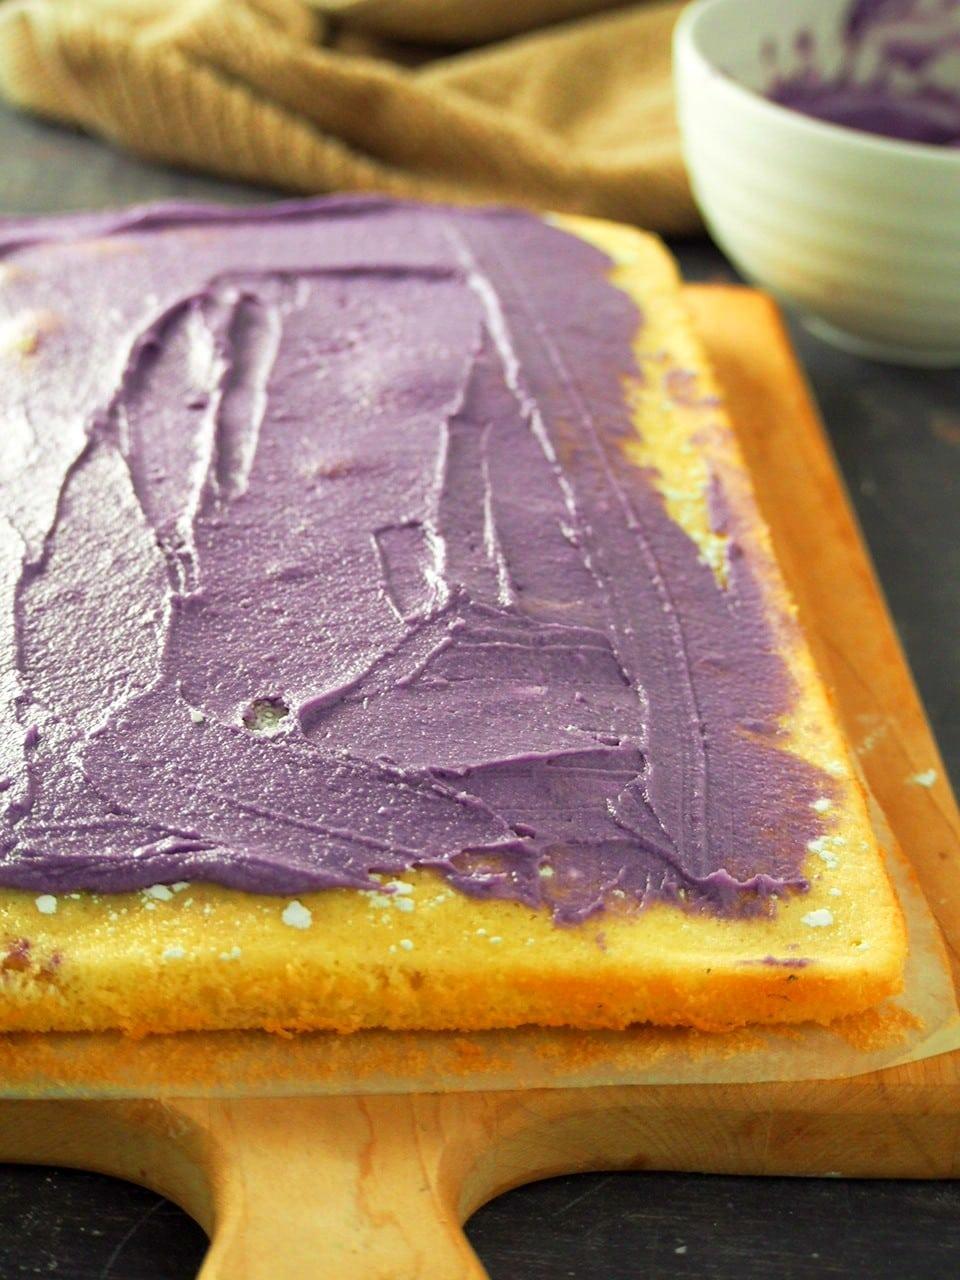 Spreading the buttercream on the vanilla cake.